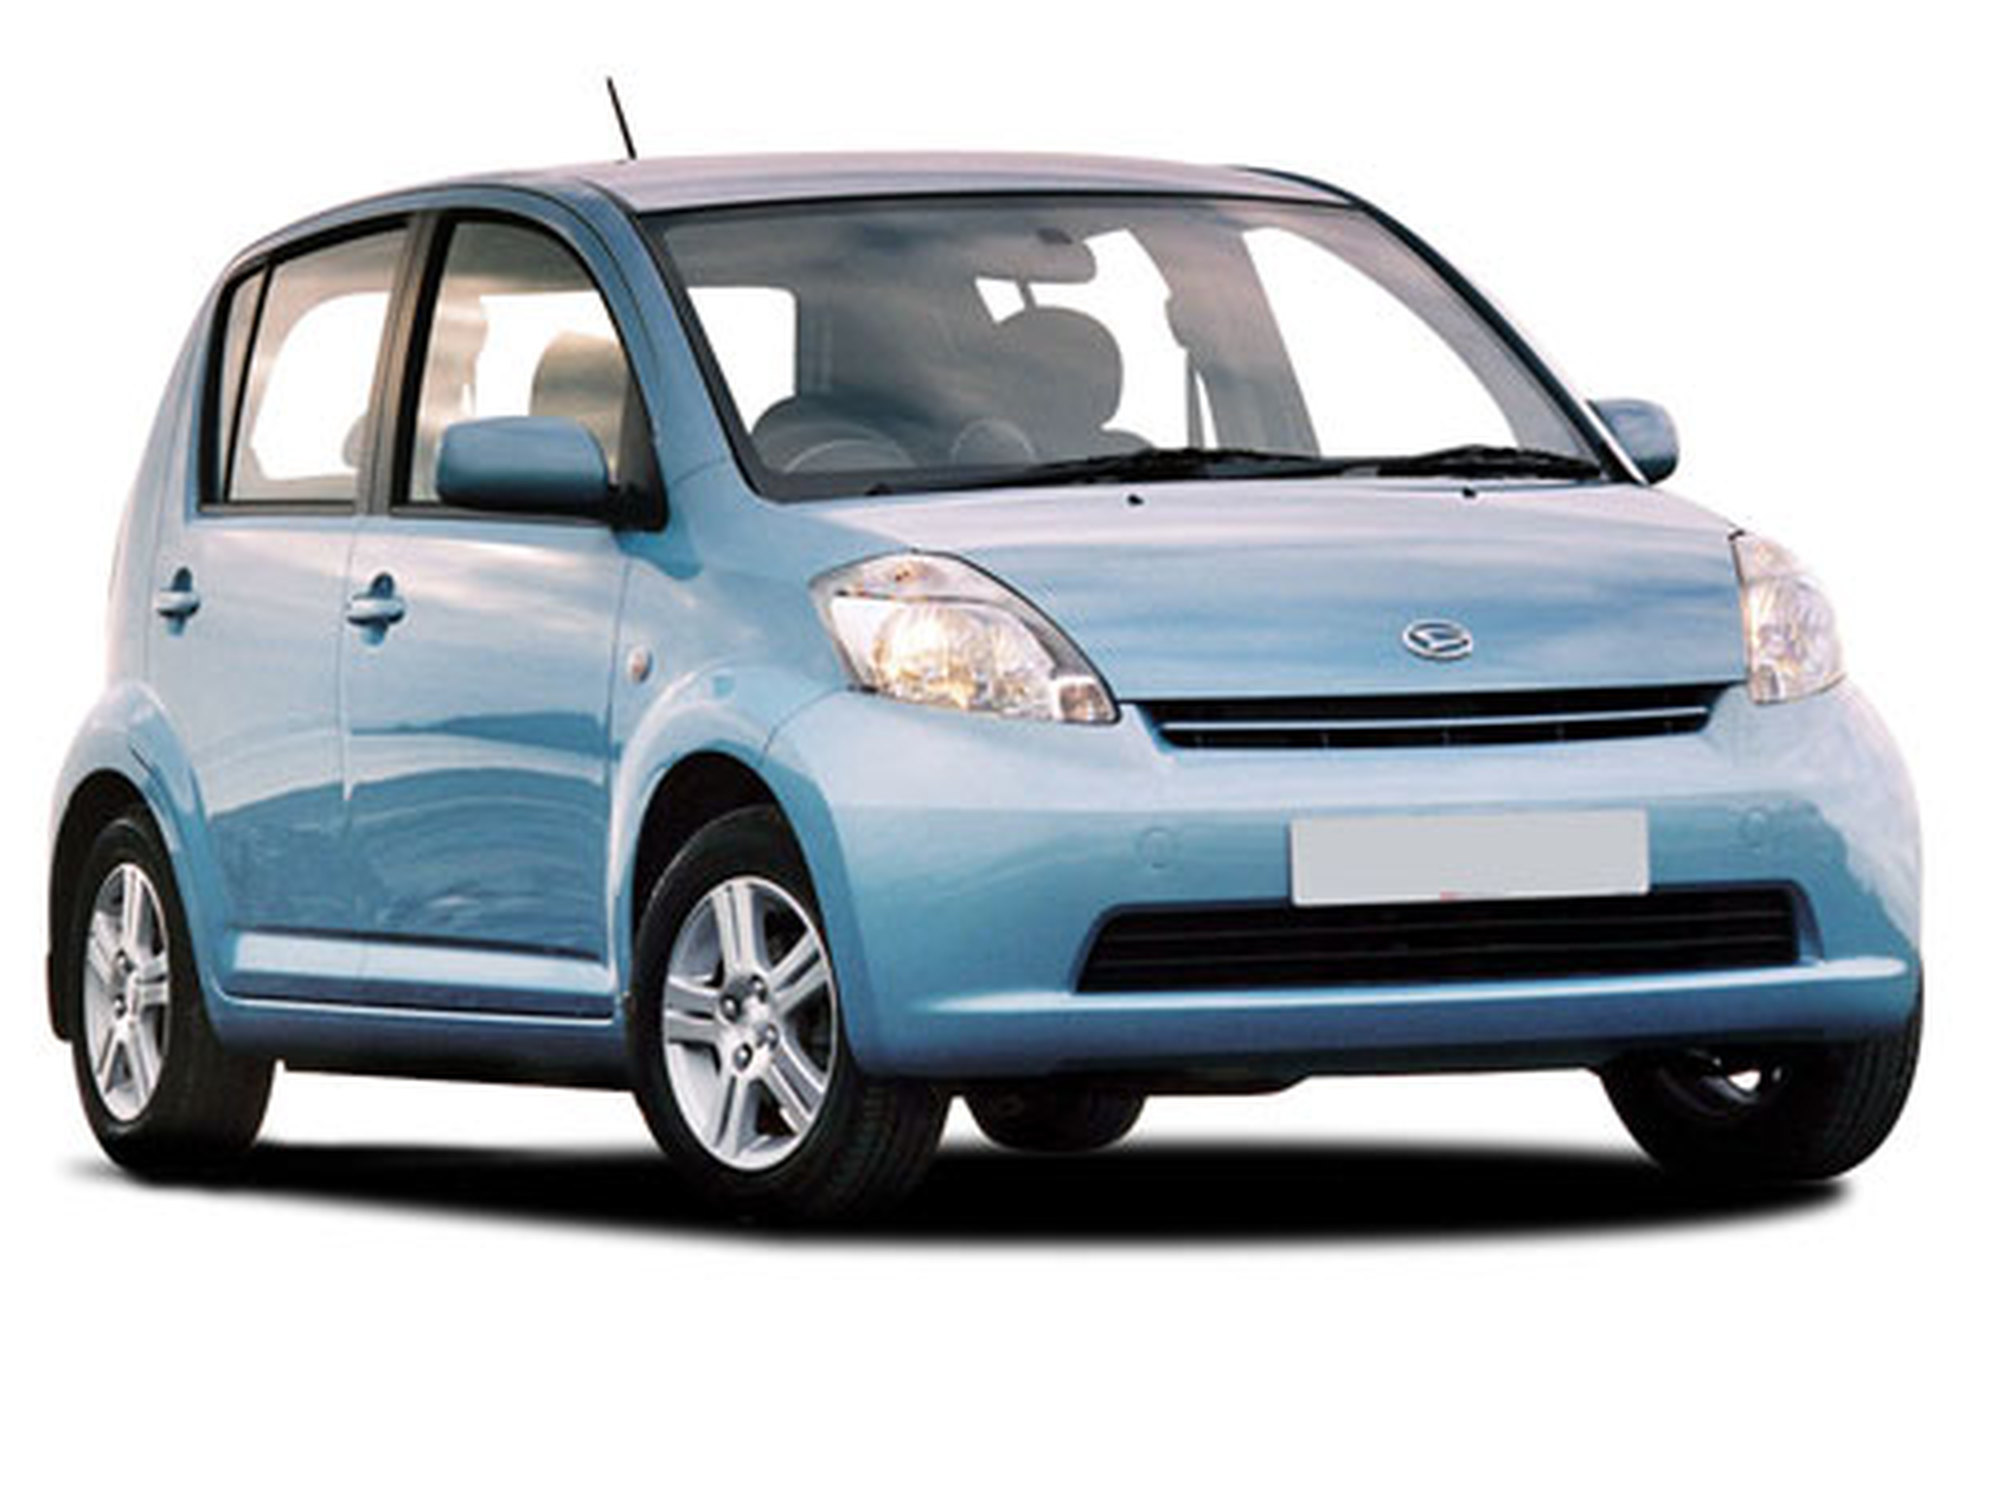 Economy Car Hire Promo Code